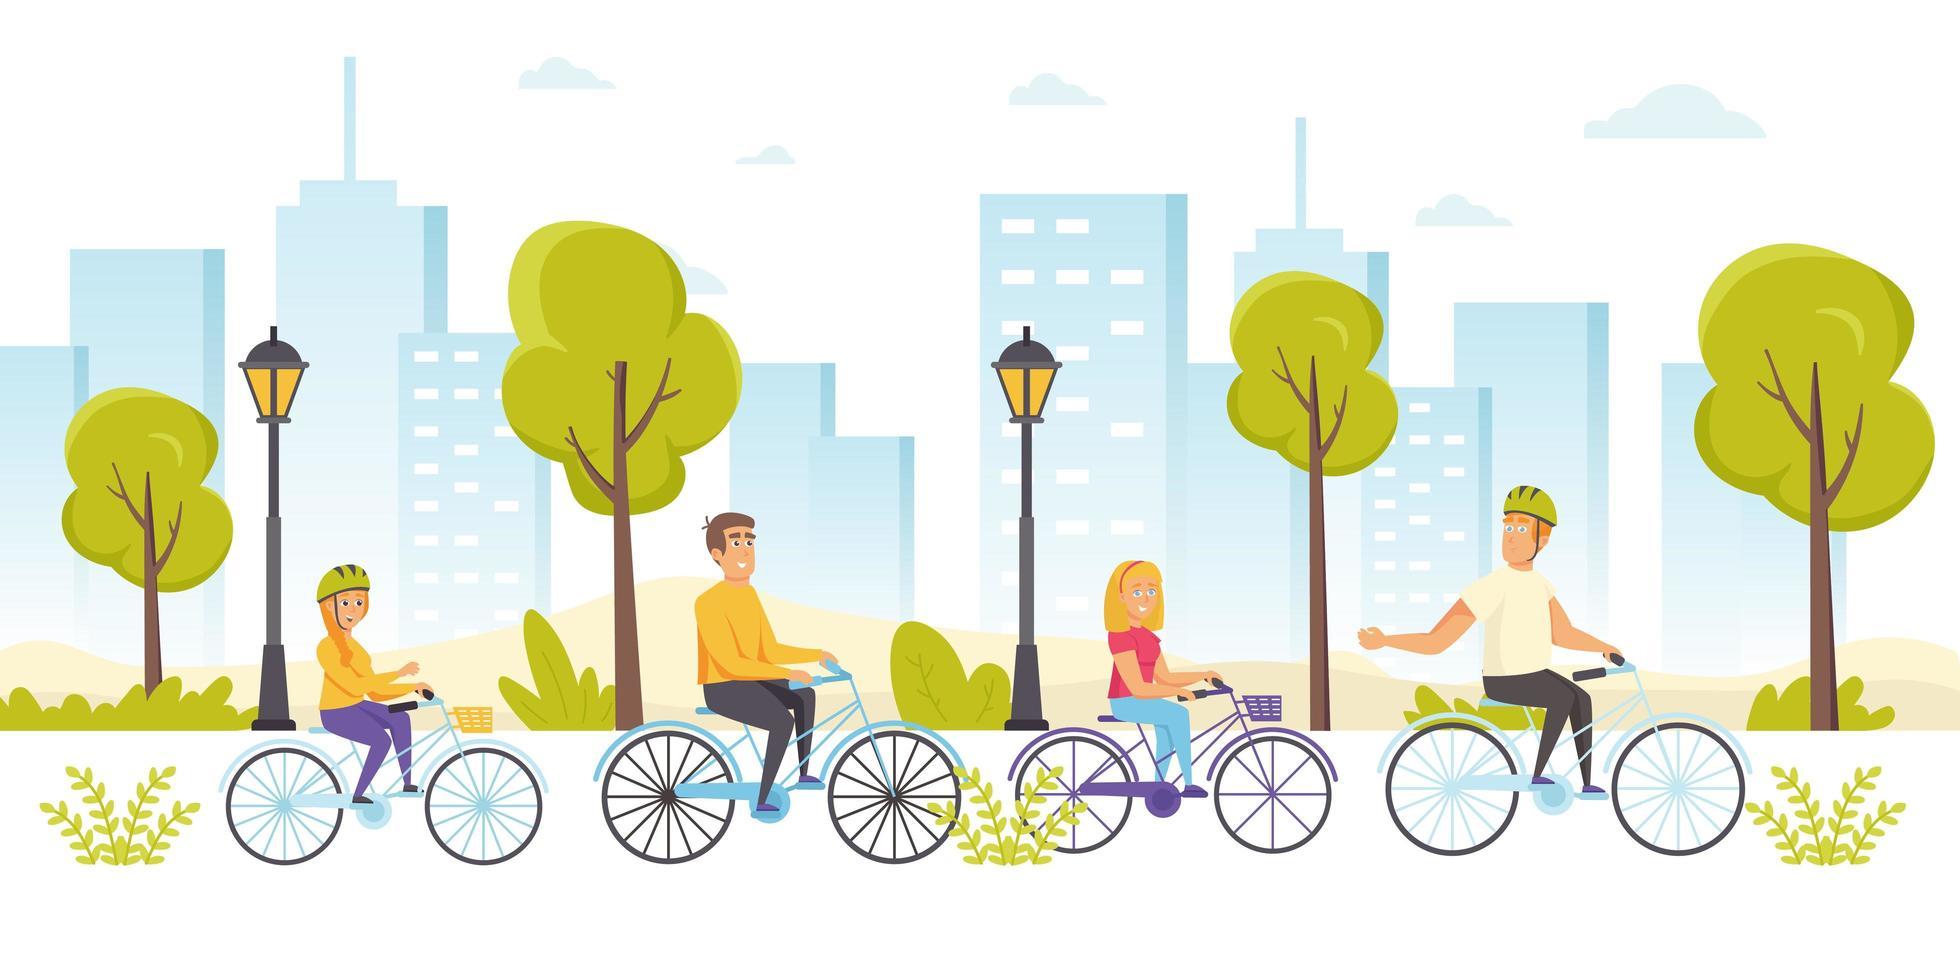 amigos felices en bicicleta vector